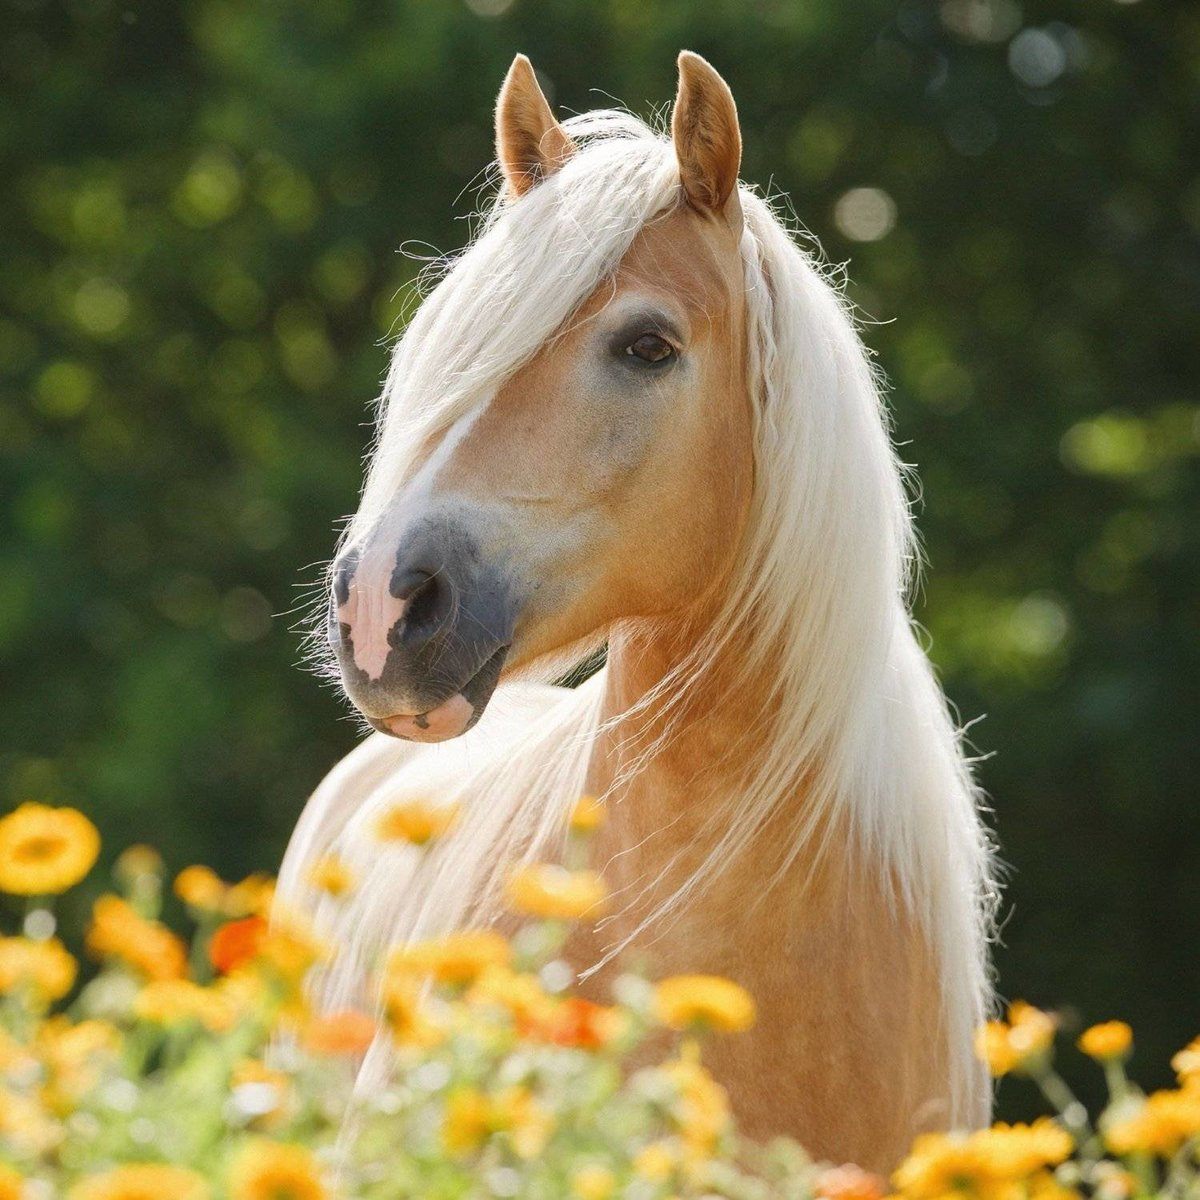 Красивые картинки кони лошади